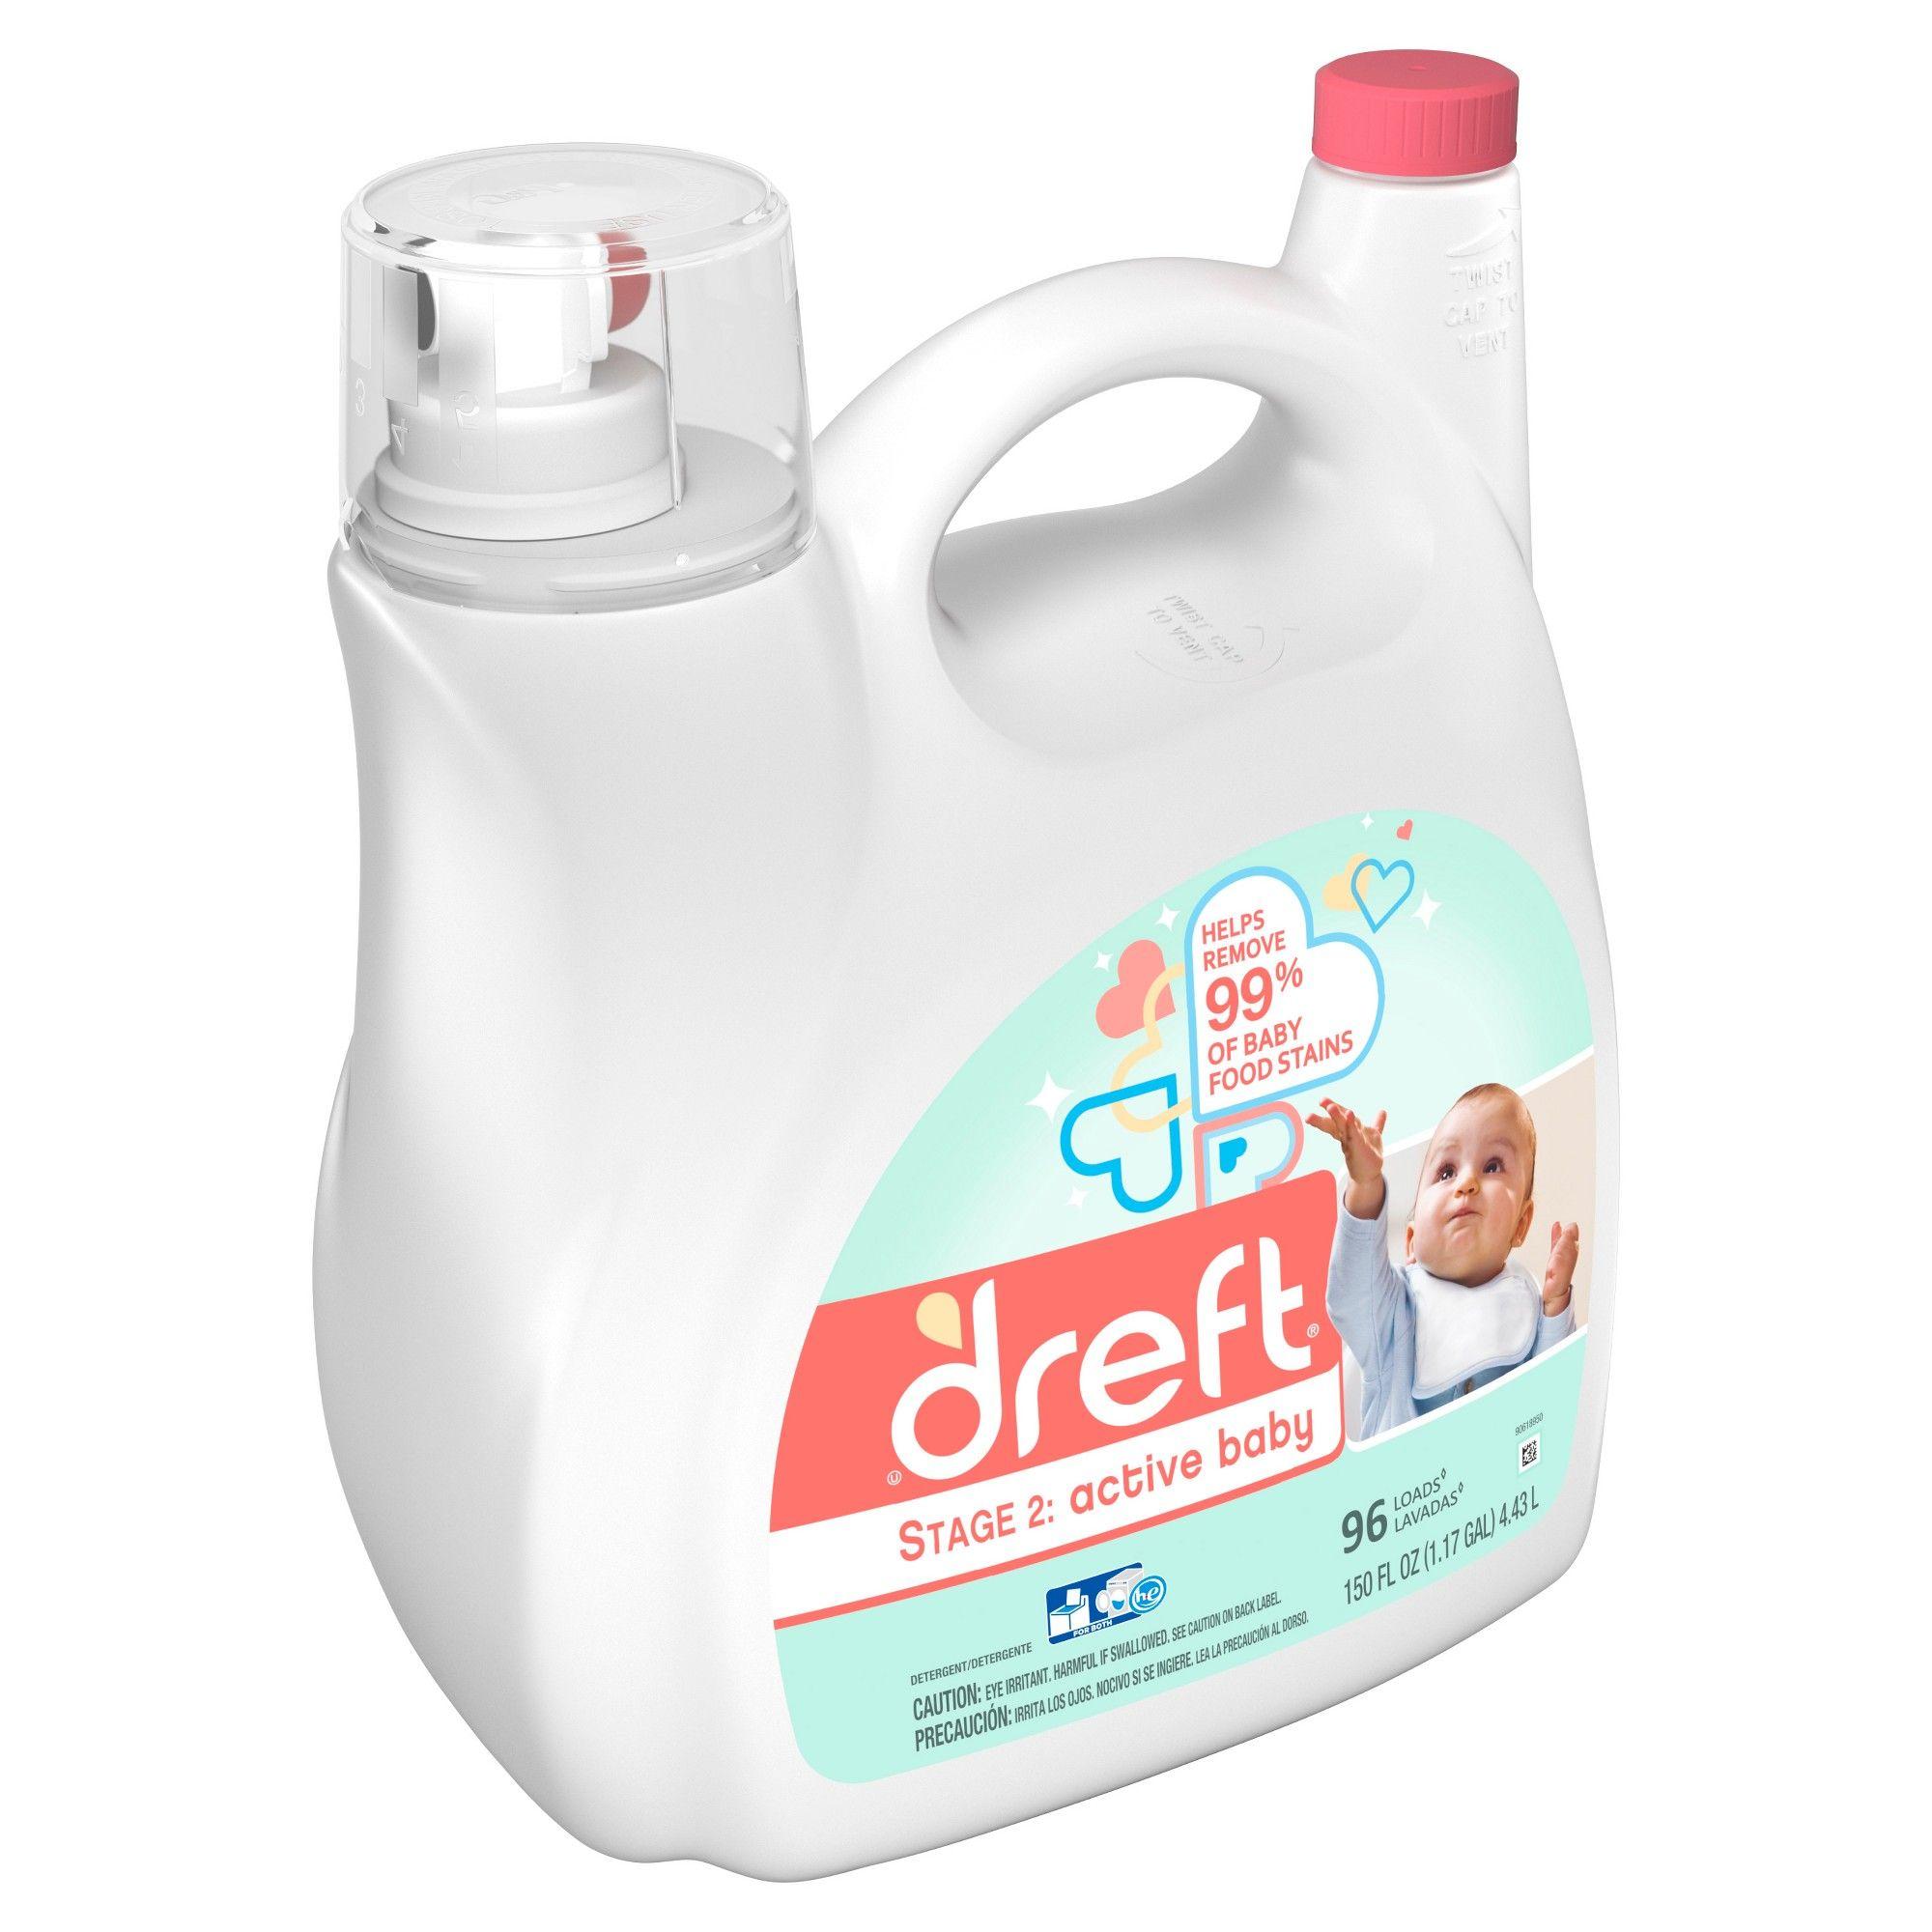 Dreft Stage 2 Active Baby He Compatible Liquid Laundry Detergent